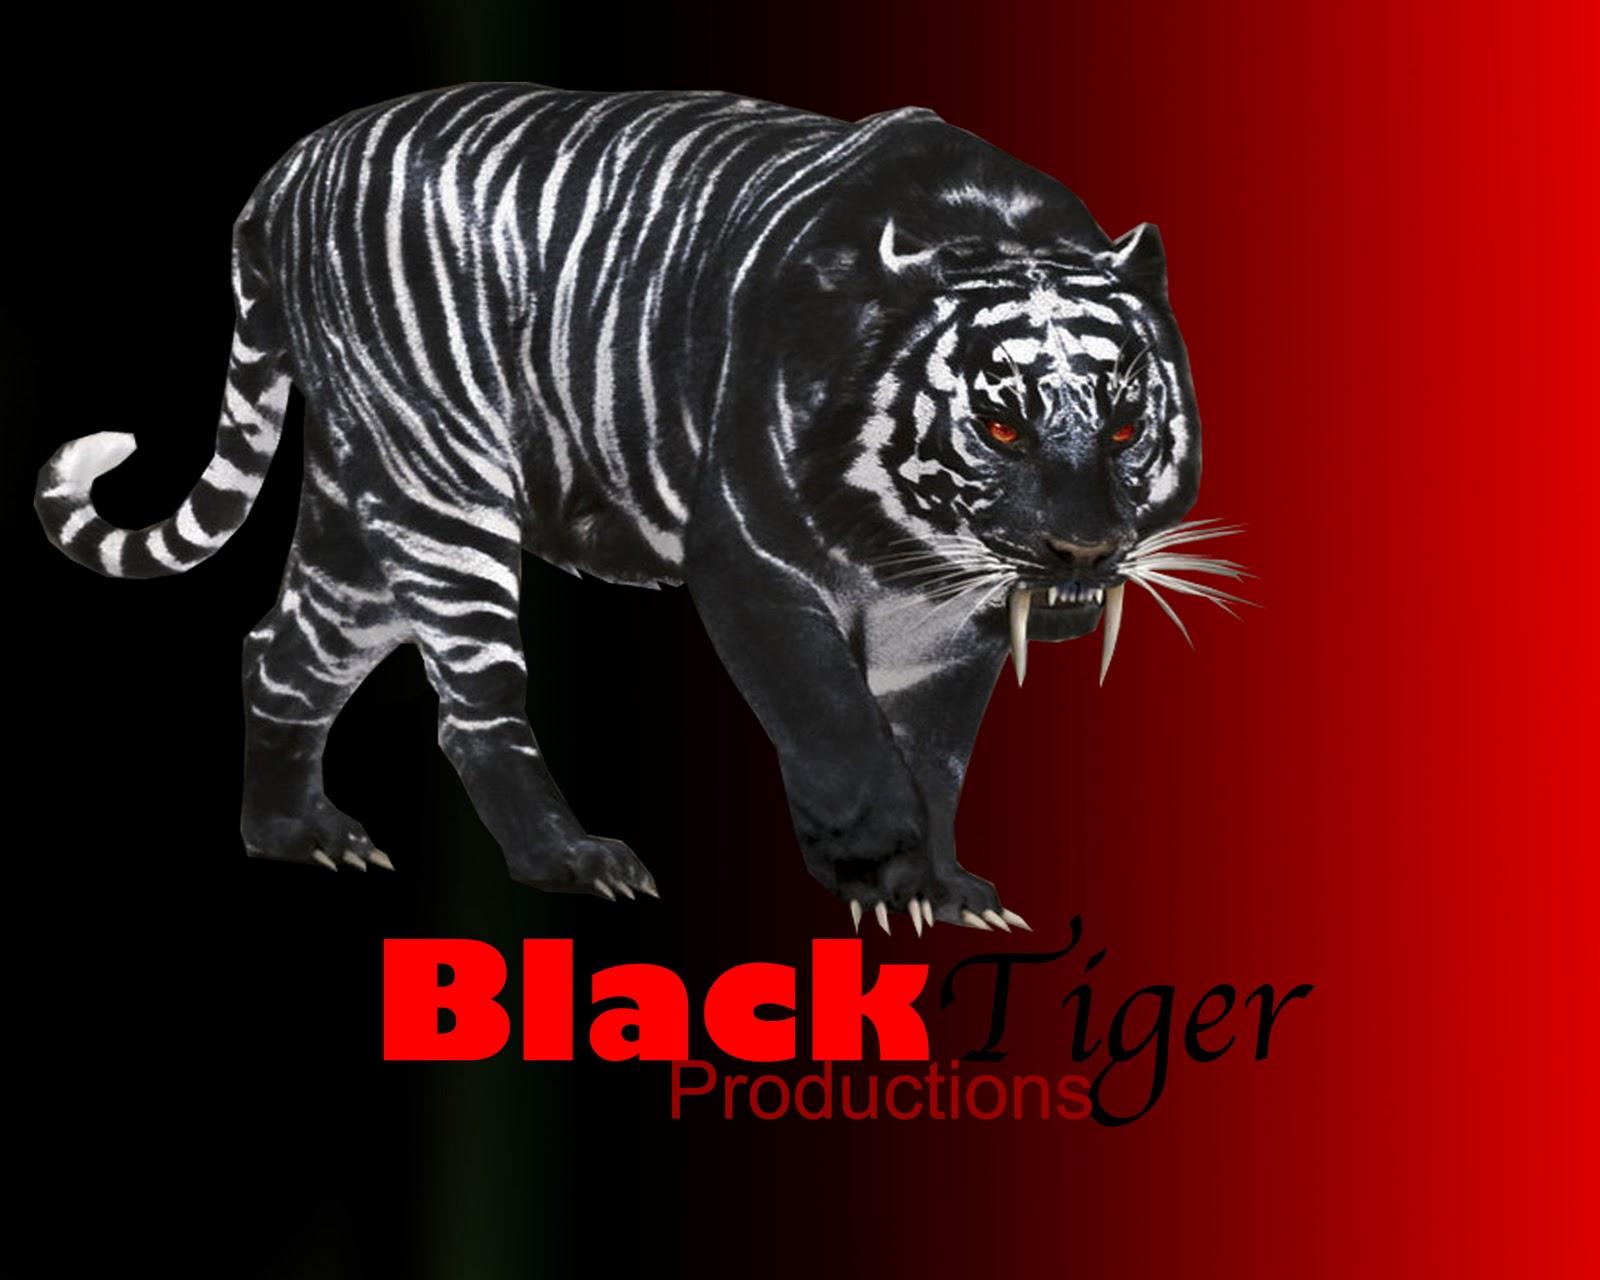 black tiger animal - photo #11